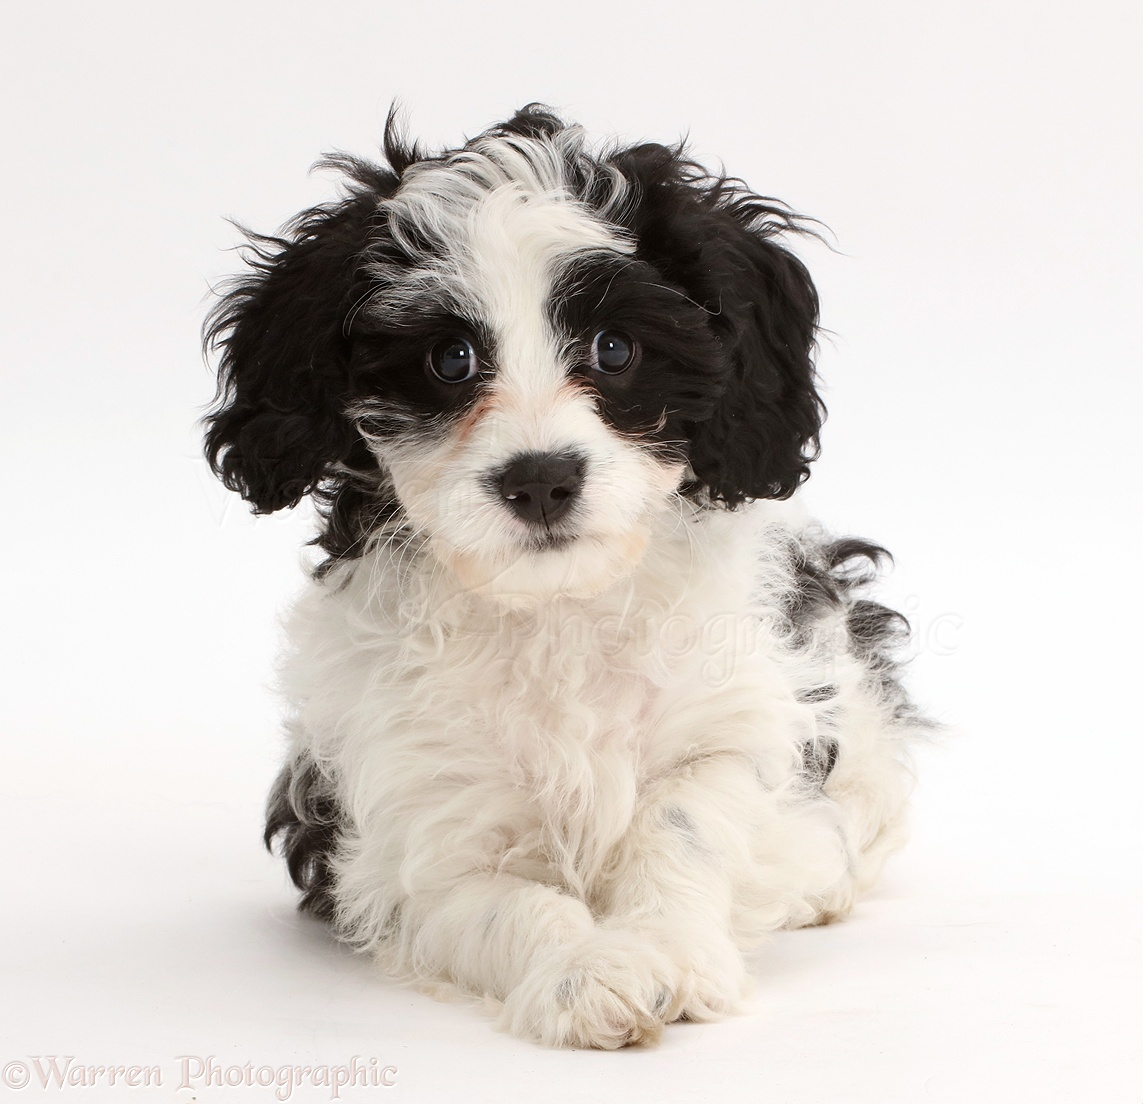 Dog Black And White Cavapoo Puppy Photo Wp43029